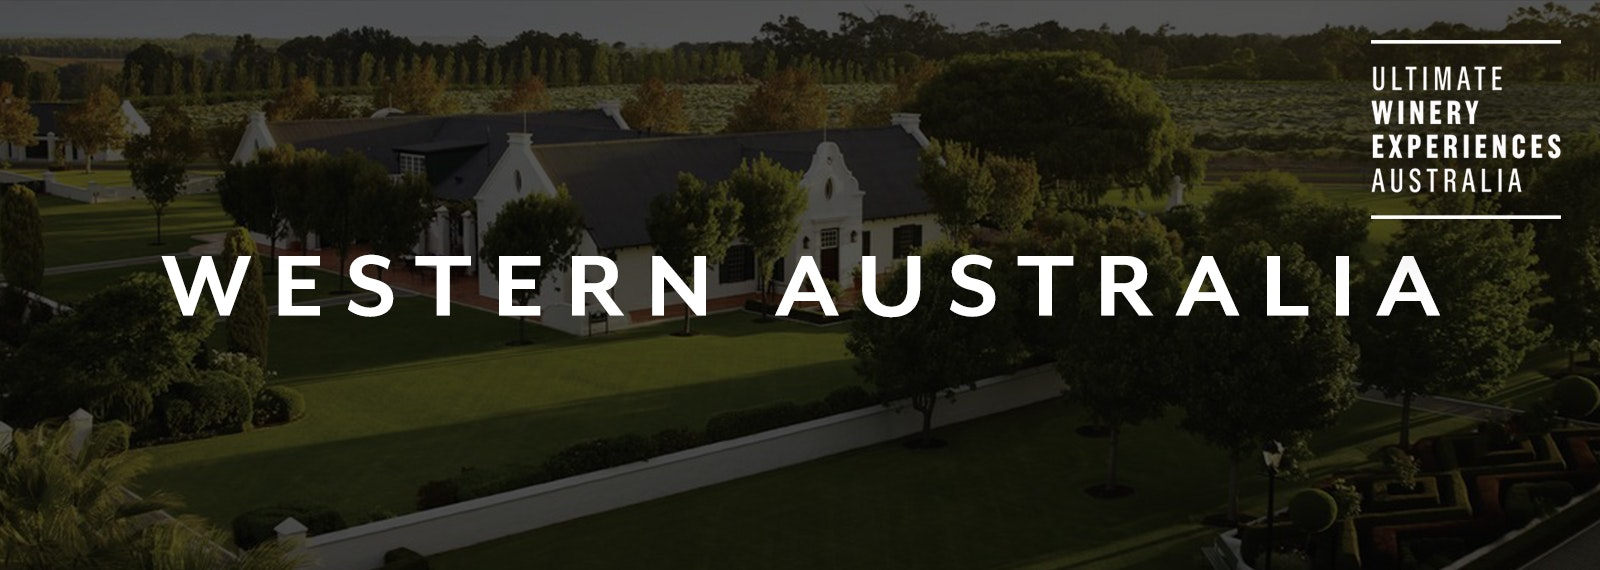 Ultimate Winery Experiences Australia - Western Australia